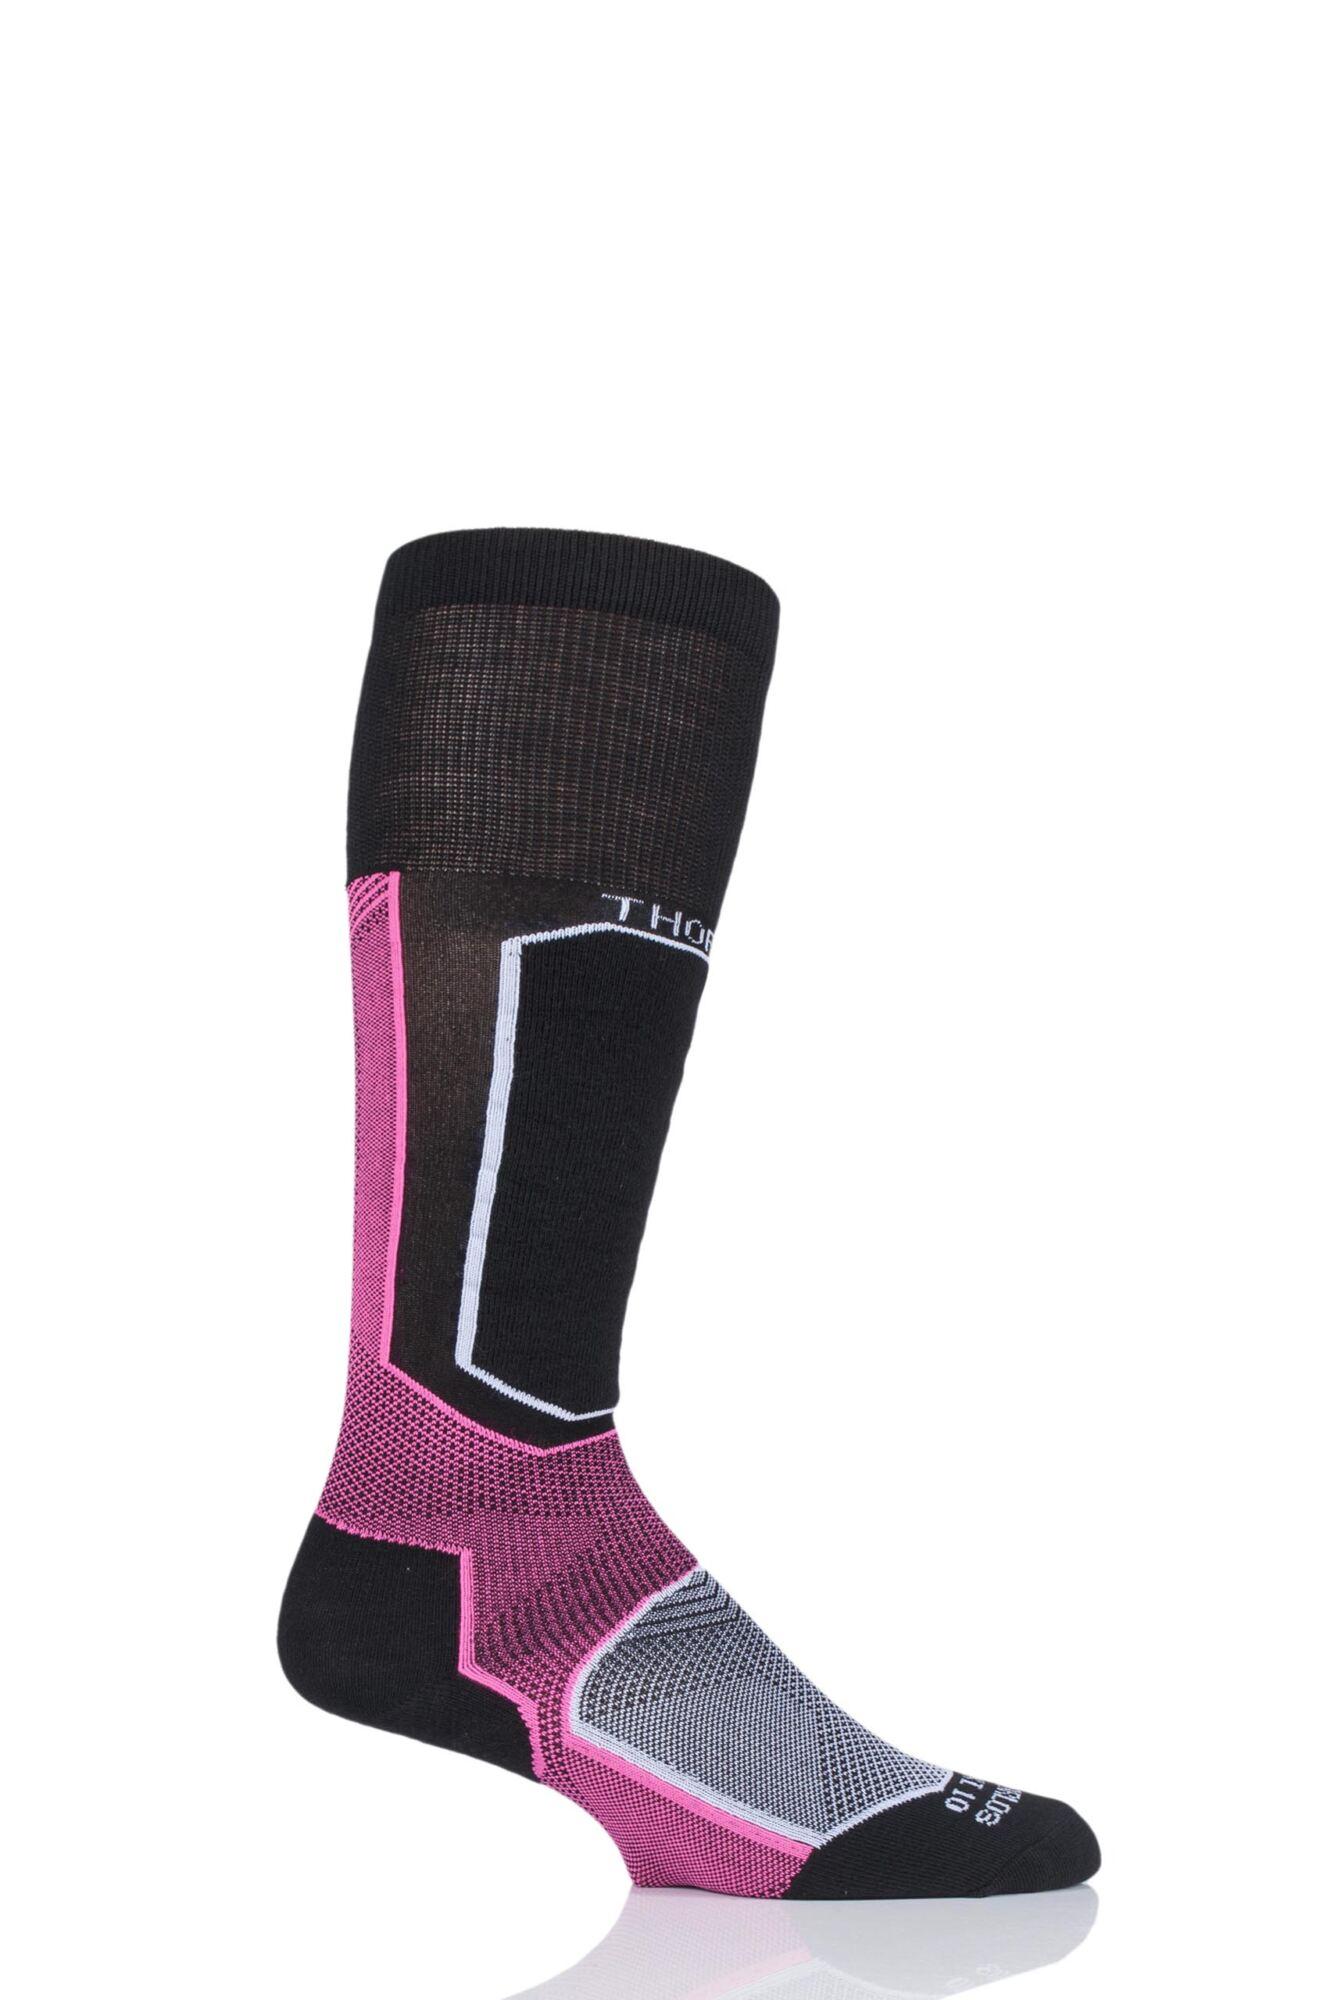 1 Pair Extreme Ski Socks Unisex - Thorlos